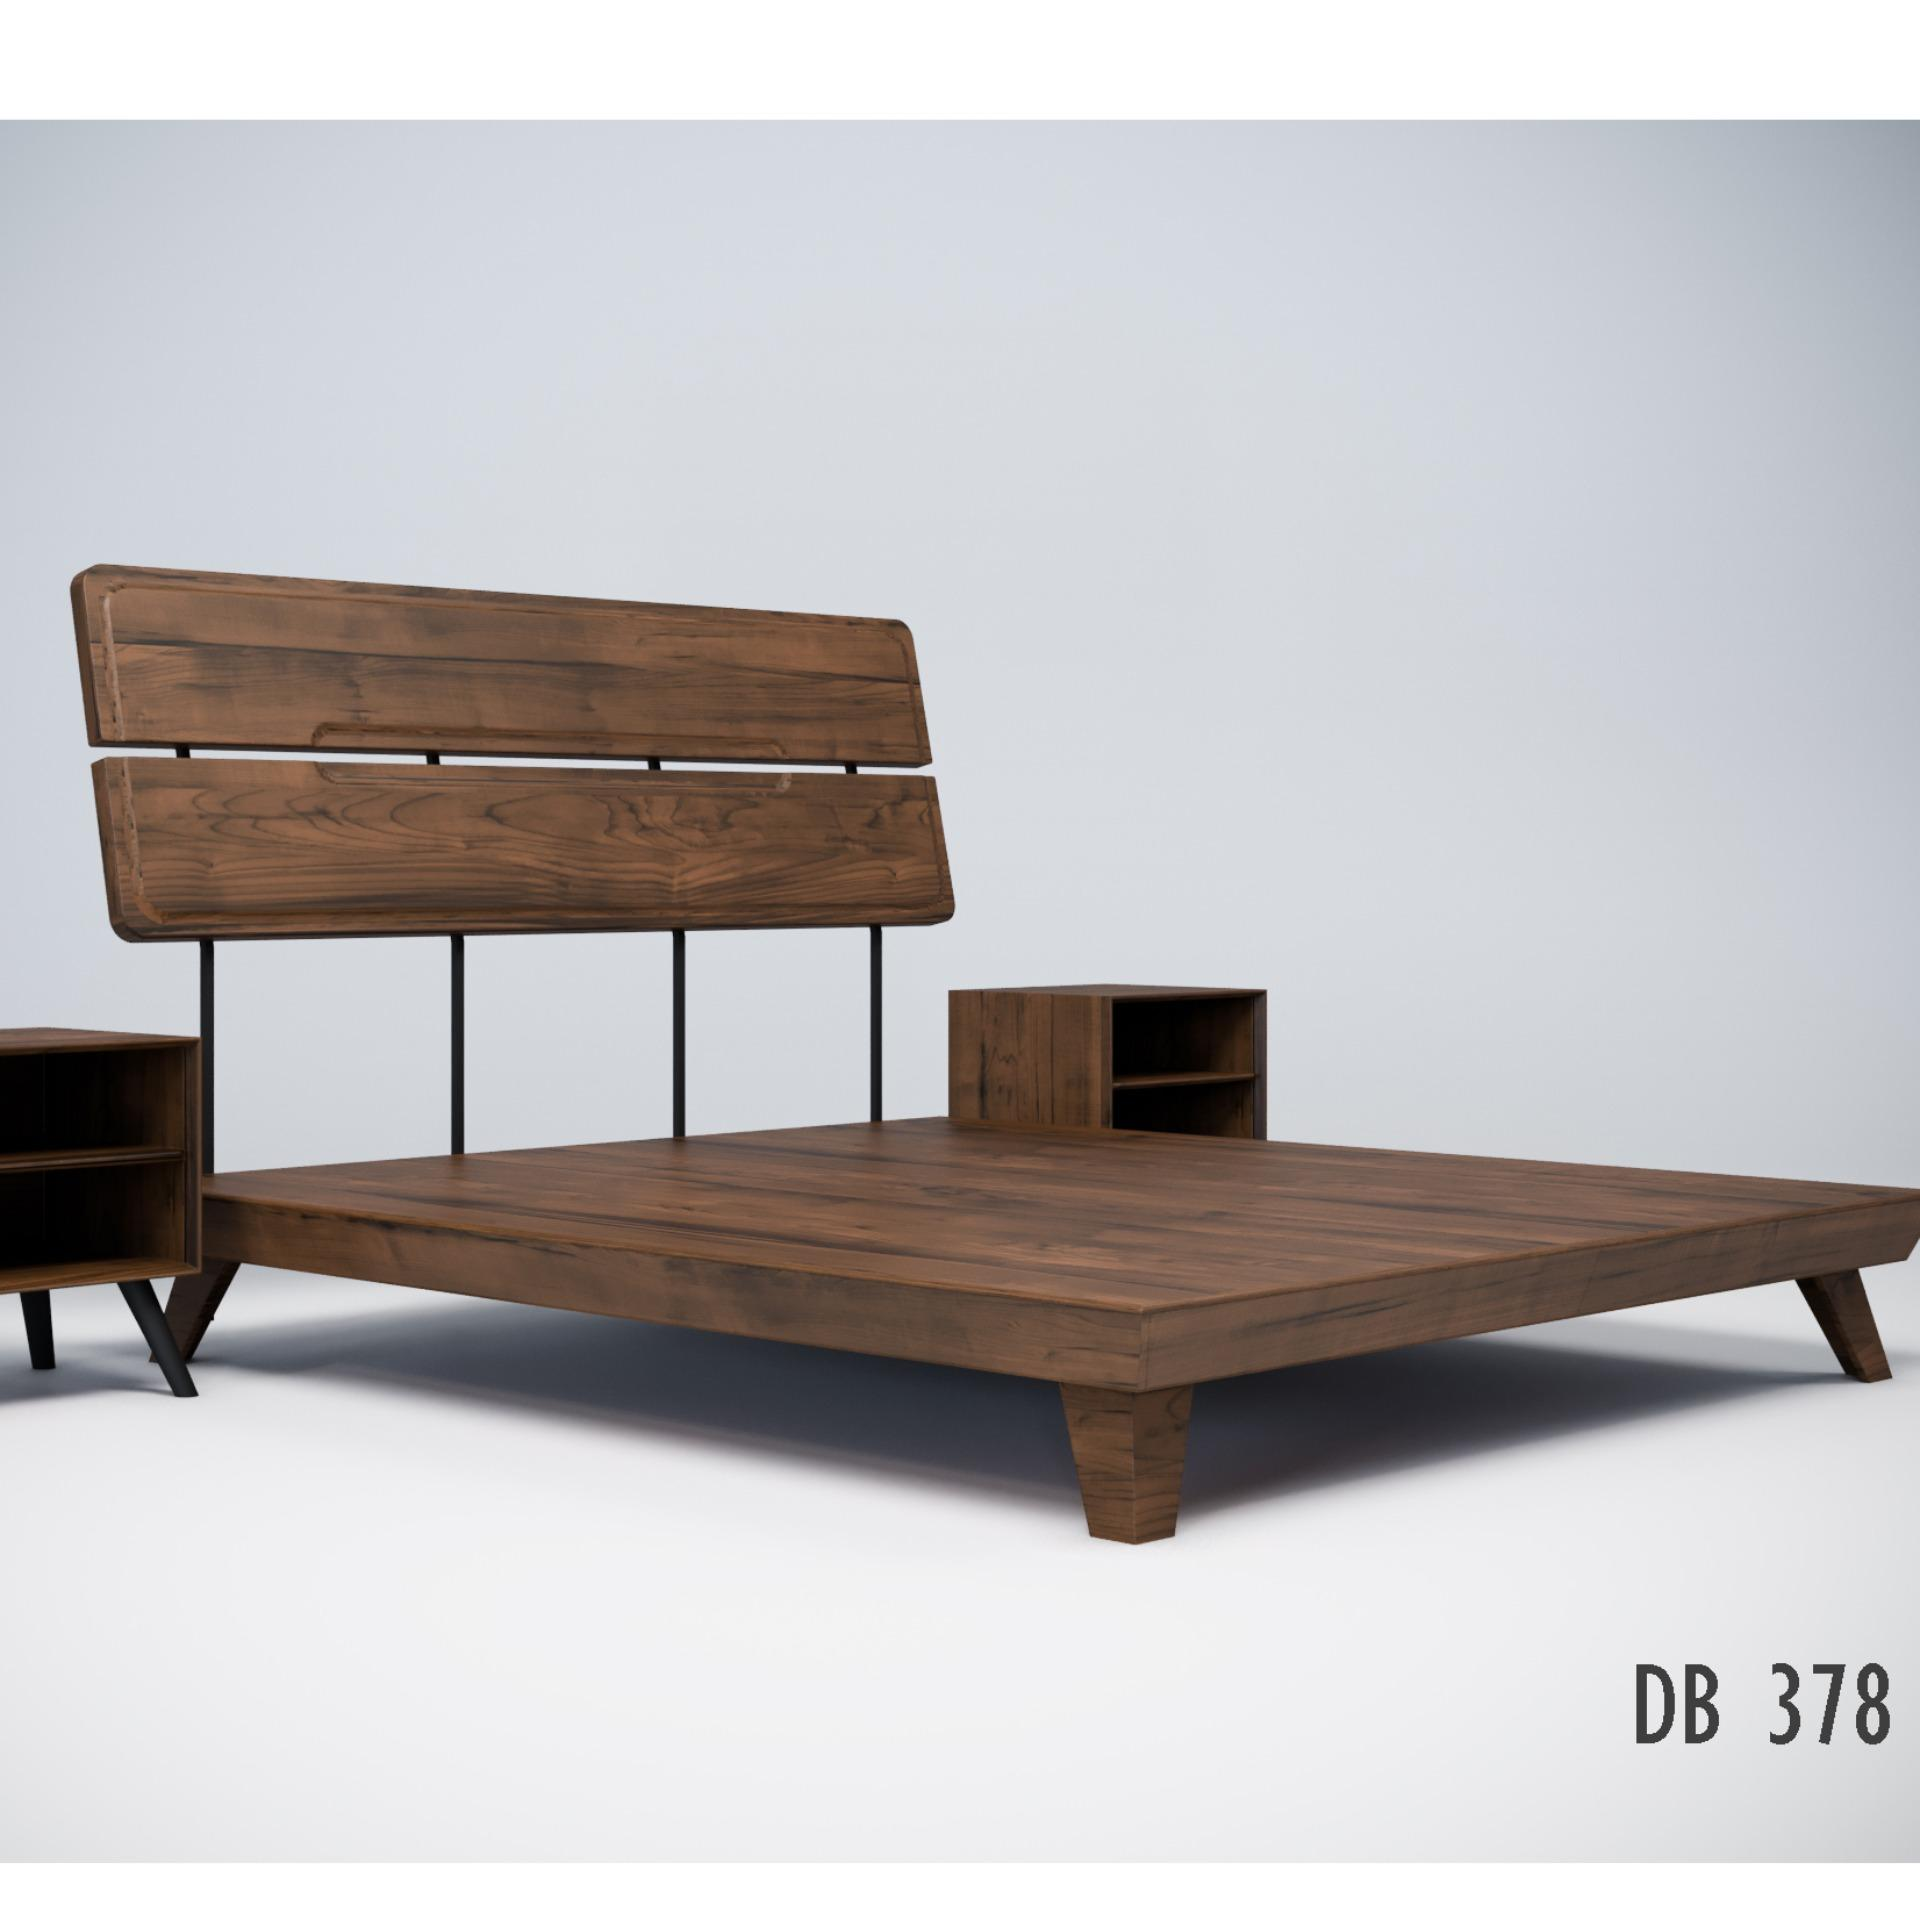 Graver Ranjang Double Bed KING Size 190  x 225 Noix Series DB 378 - Tanpa Kasur & Nakkas - Columbia Walnut